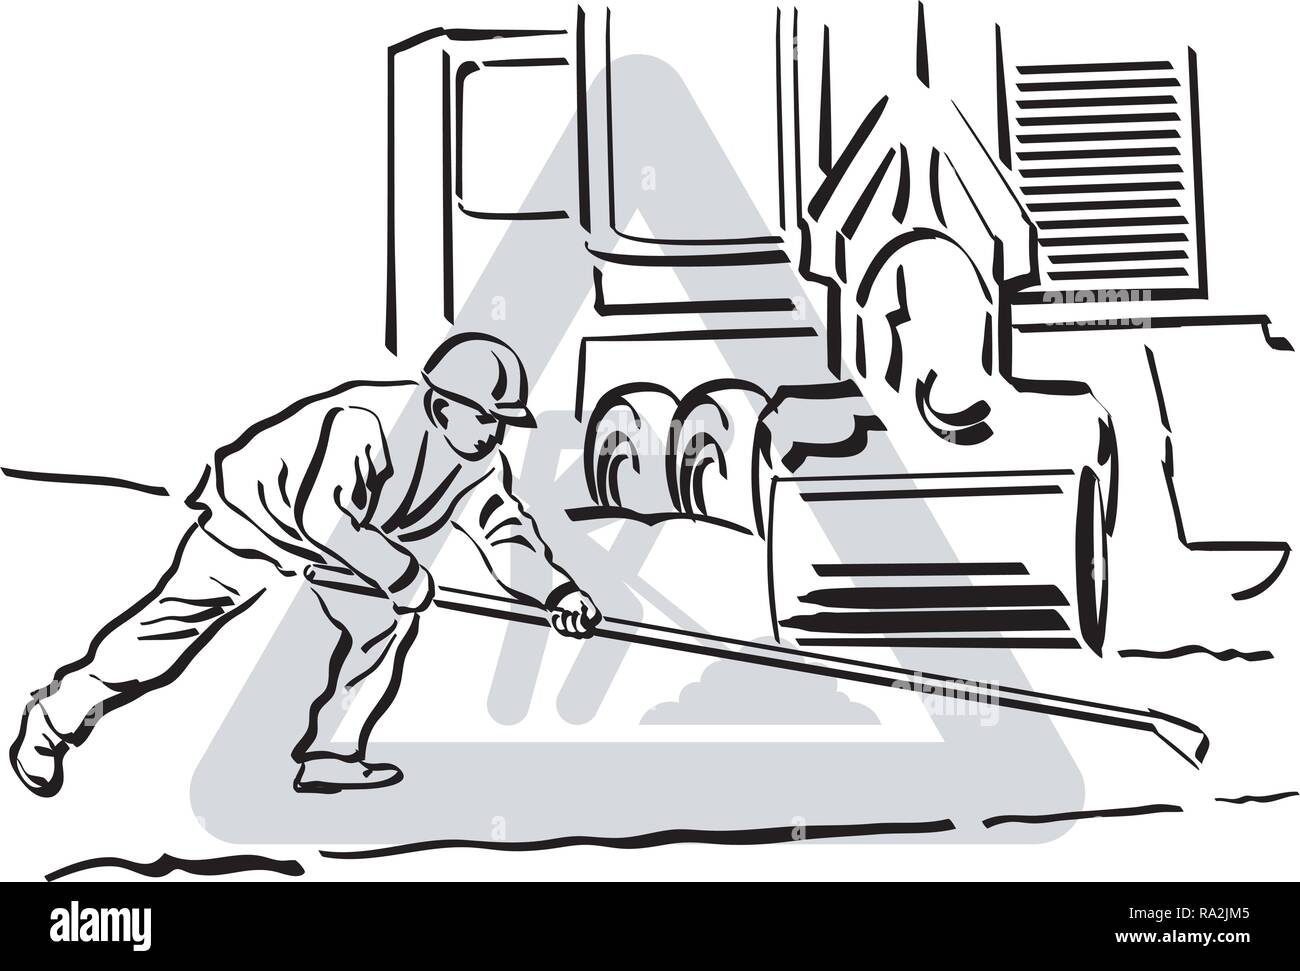 A vector illustration of an asphalt worker at work. - Stock Vector